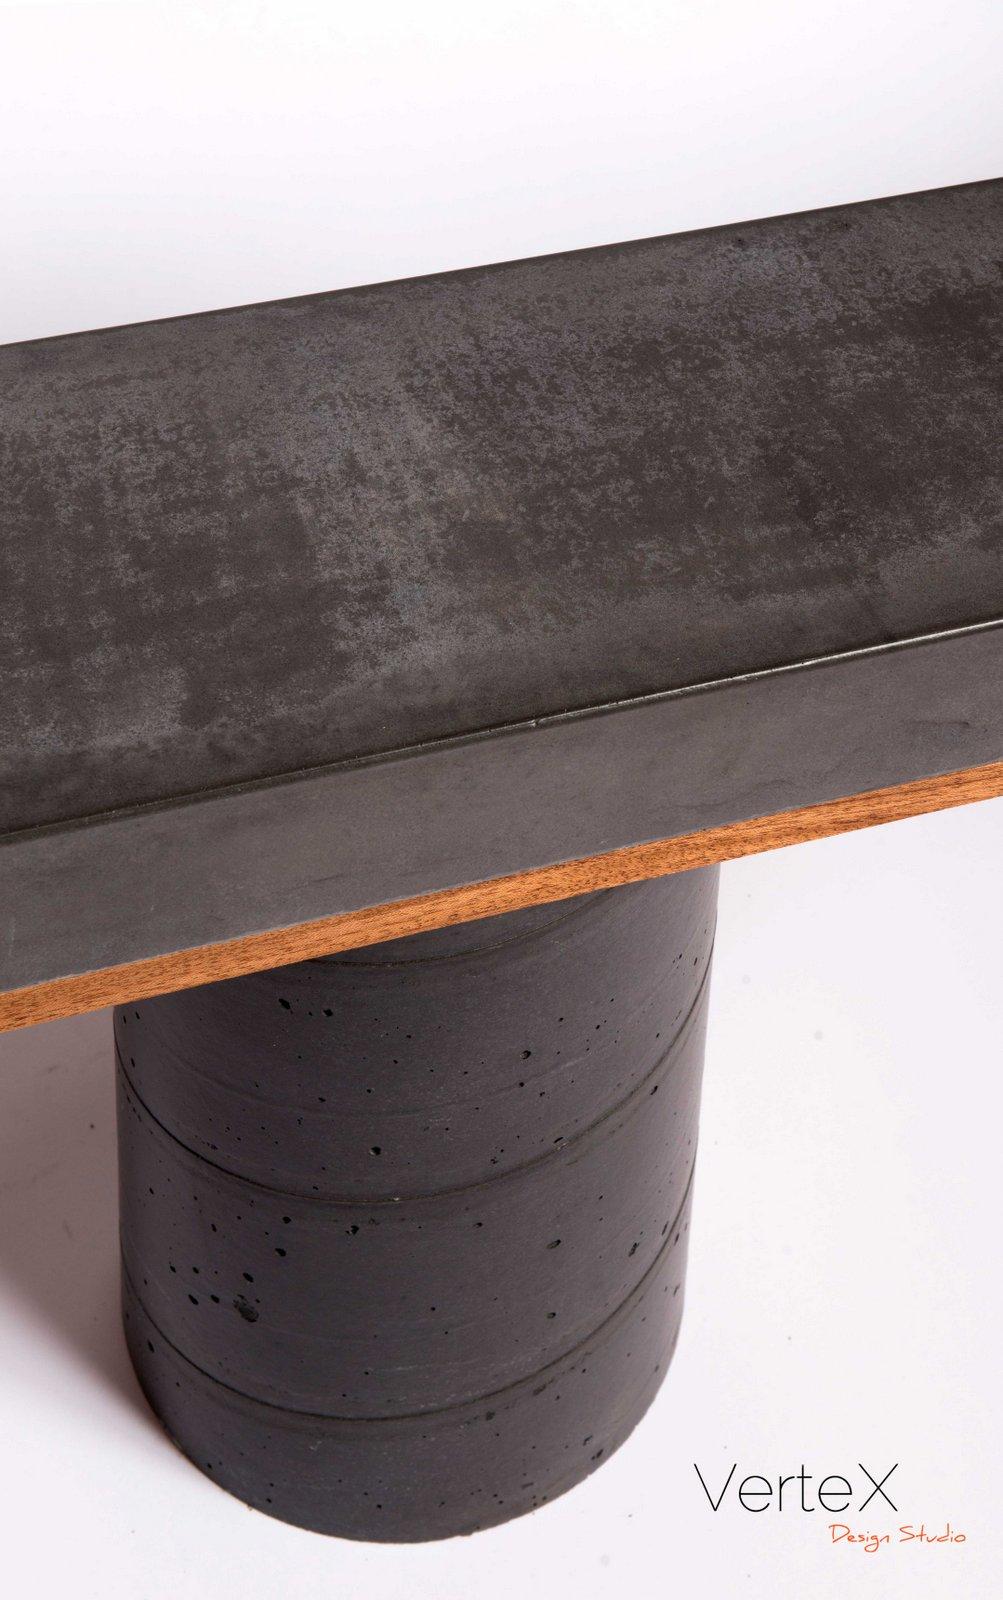 3-16-0615-Black-Bench-VerteX-design-studio-02